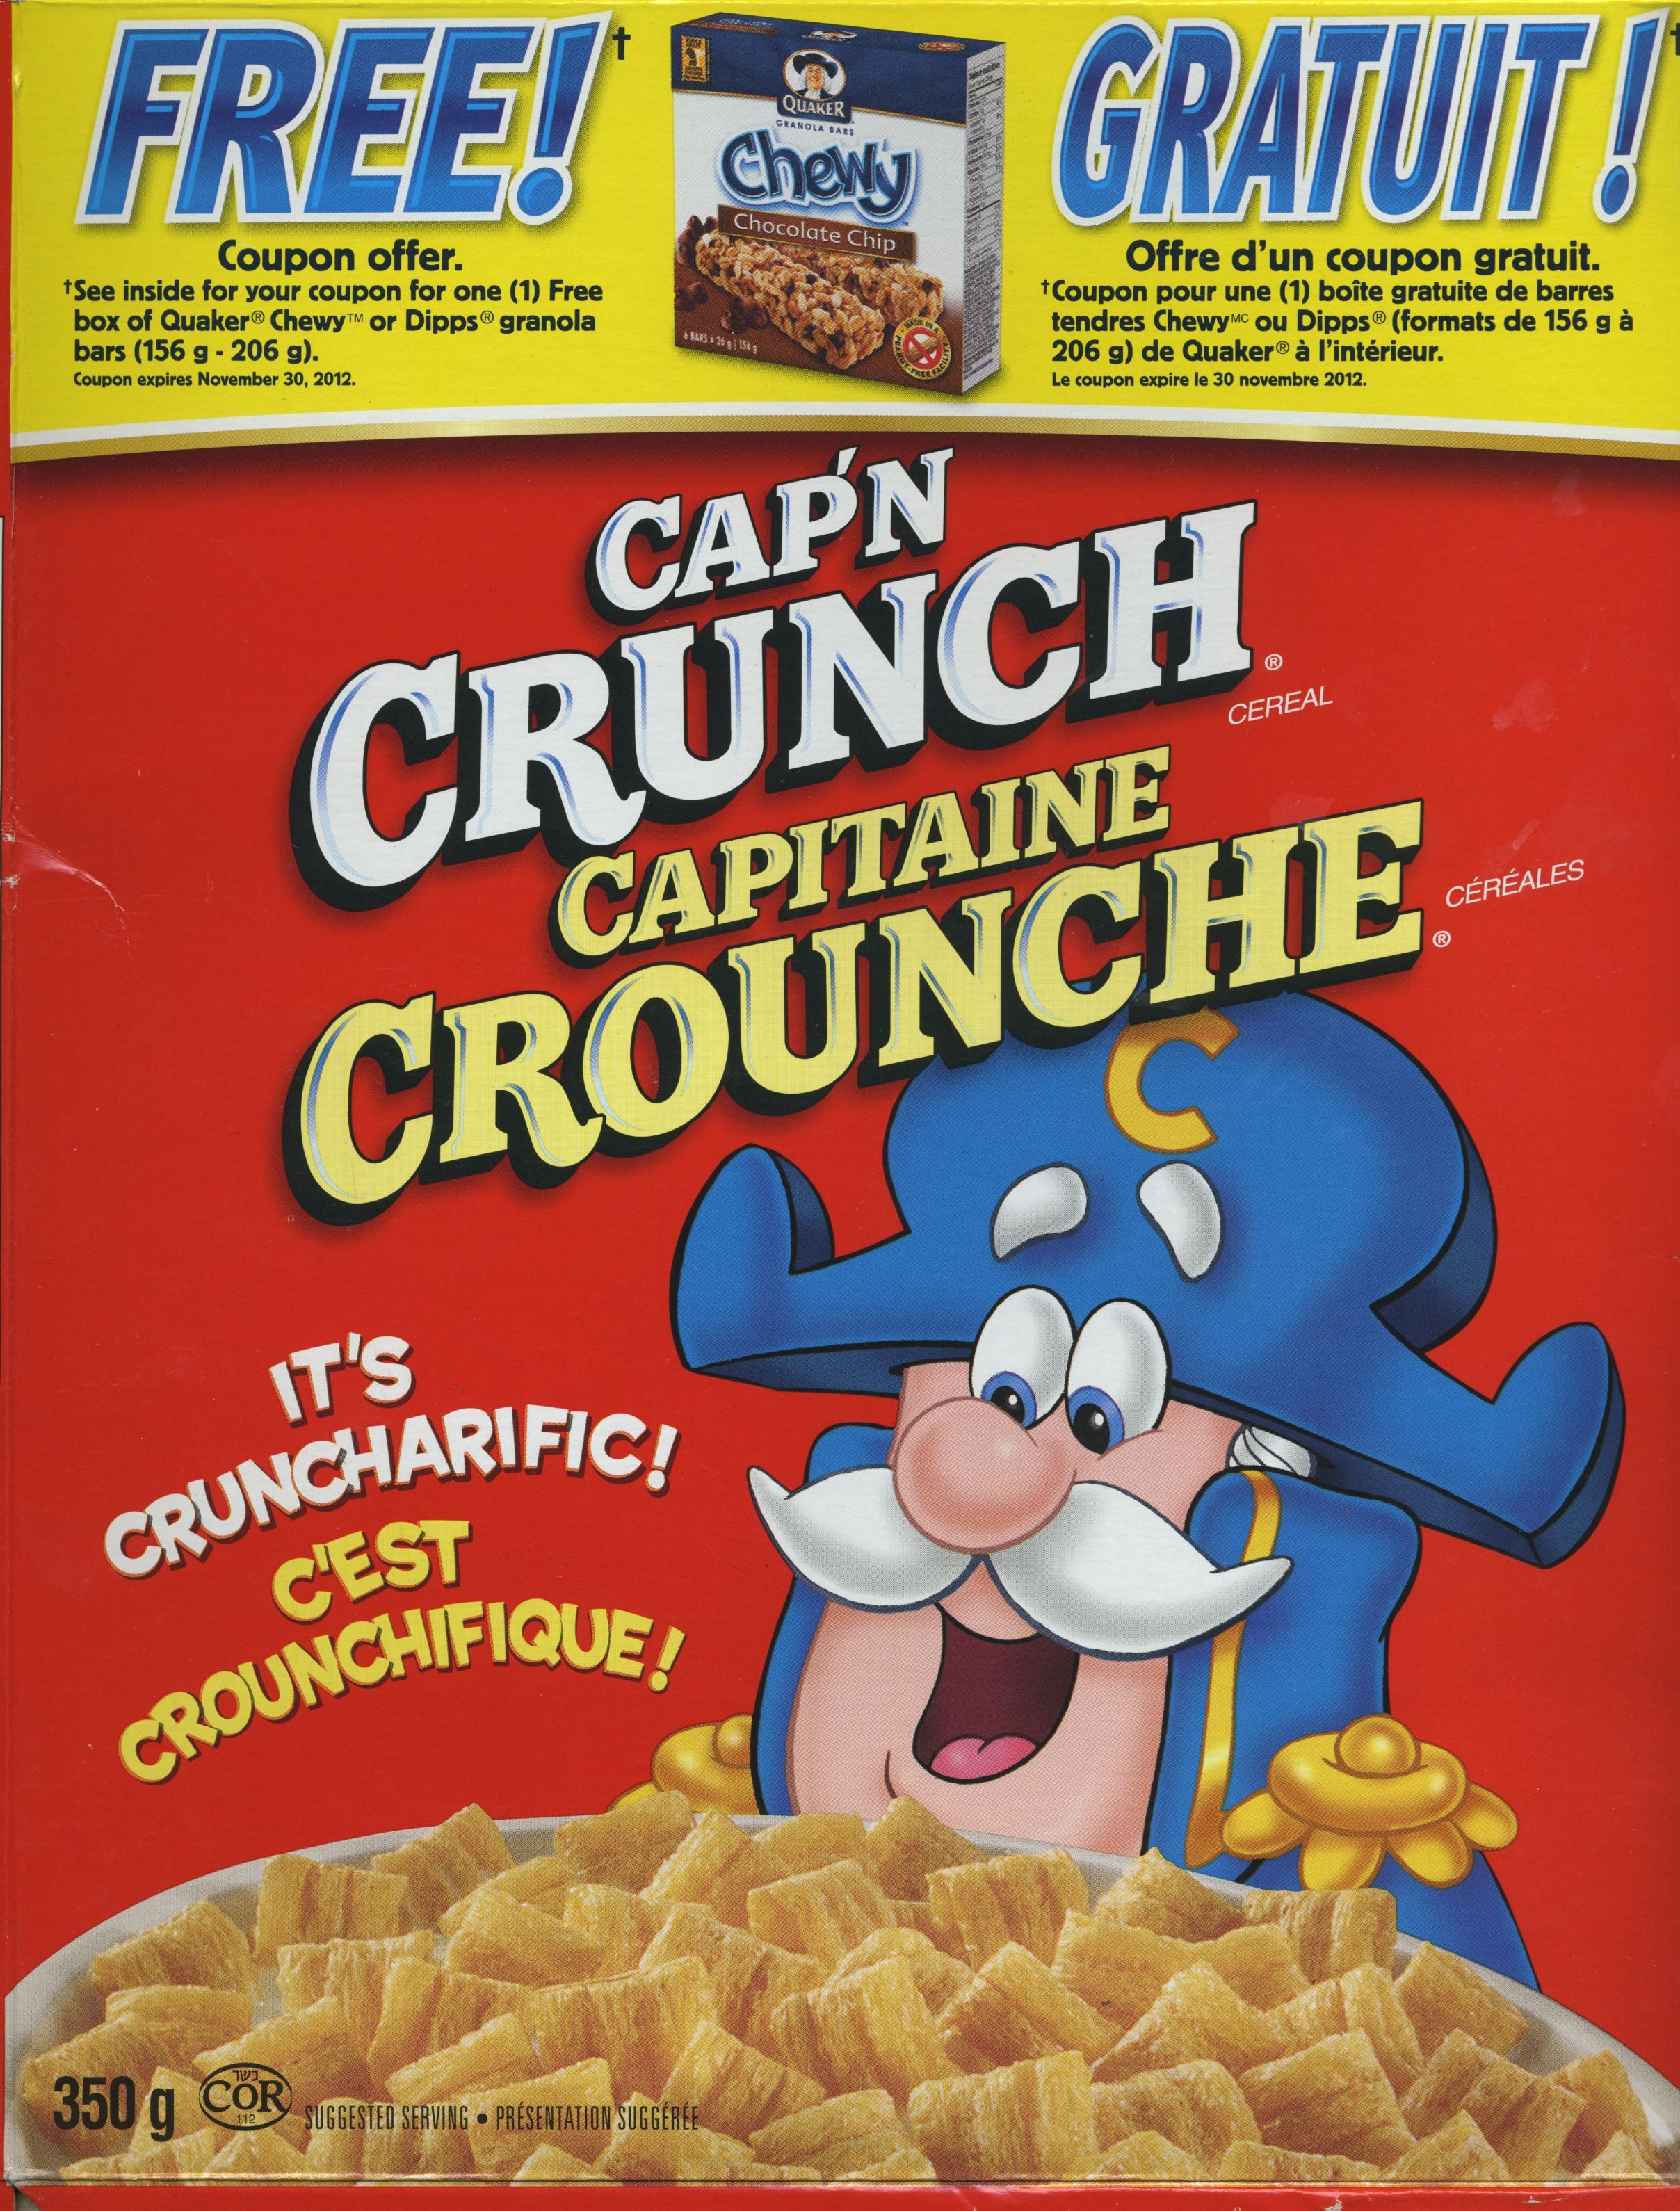 capitaine crounche , canada © quaker oats ca. 2011 | cereals